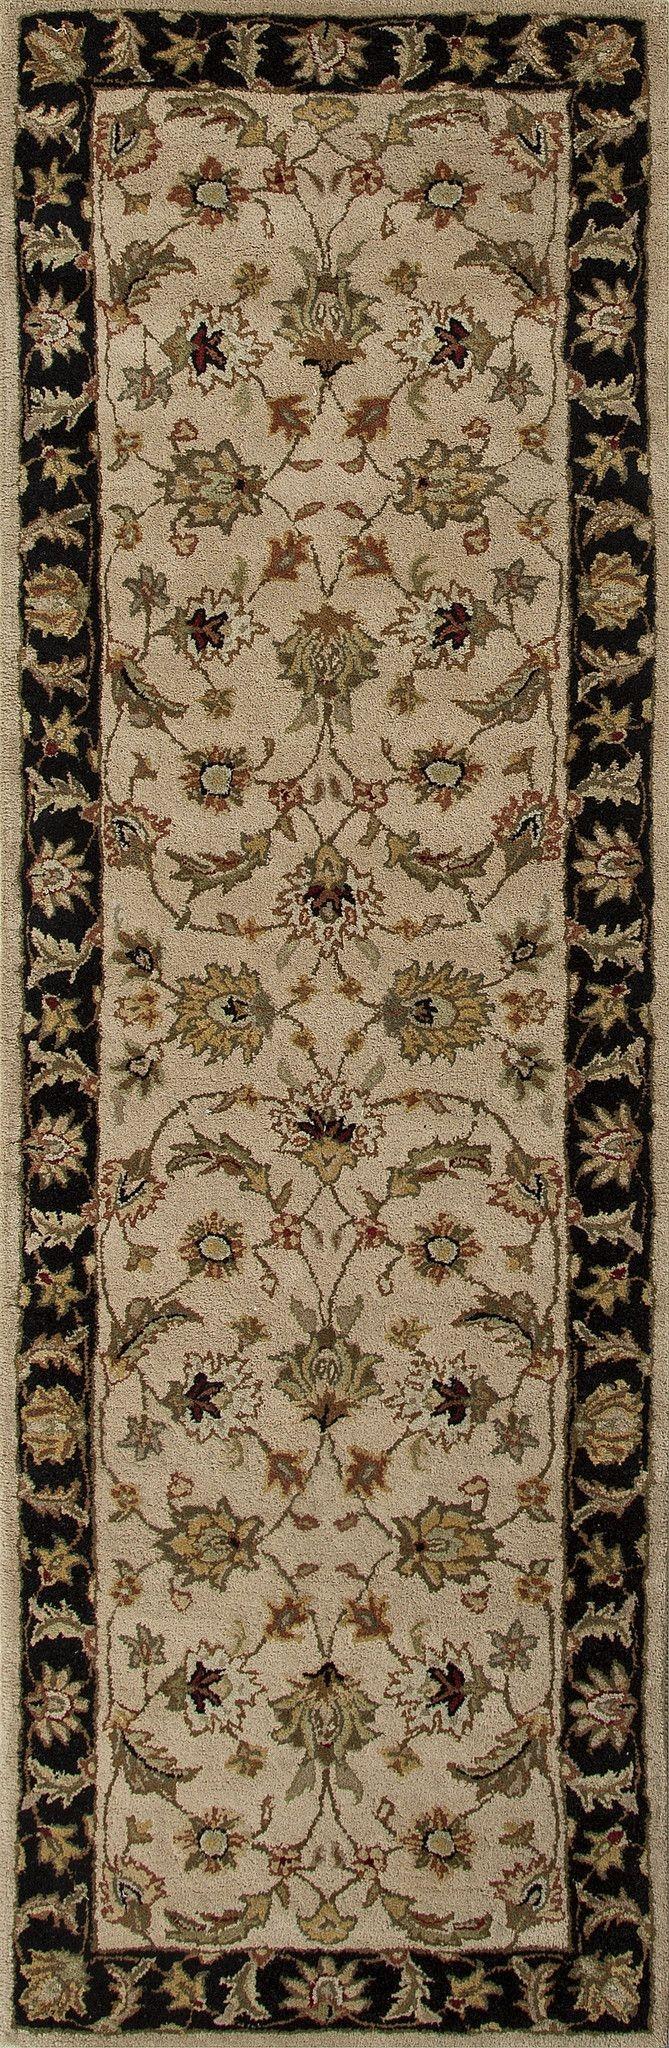 Jaipur Rugs Classic Oriental Pattern Taupeblack Wool Area Rug Pertaining To Black Wool Area Rugs (#11 of 15)